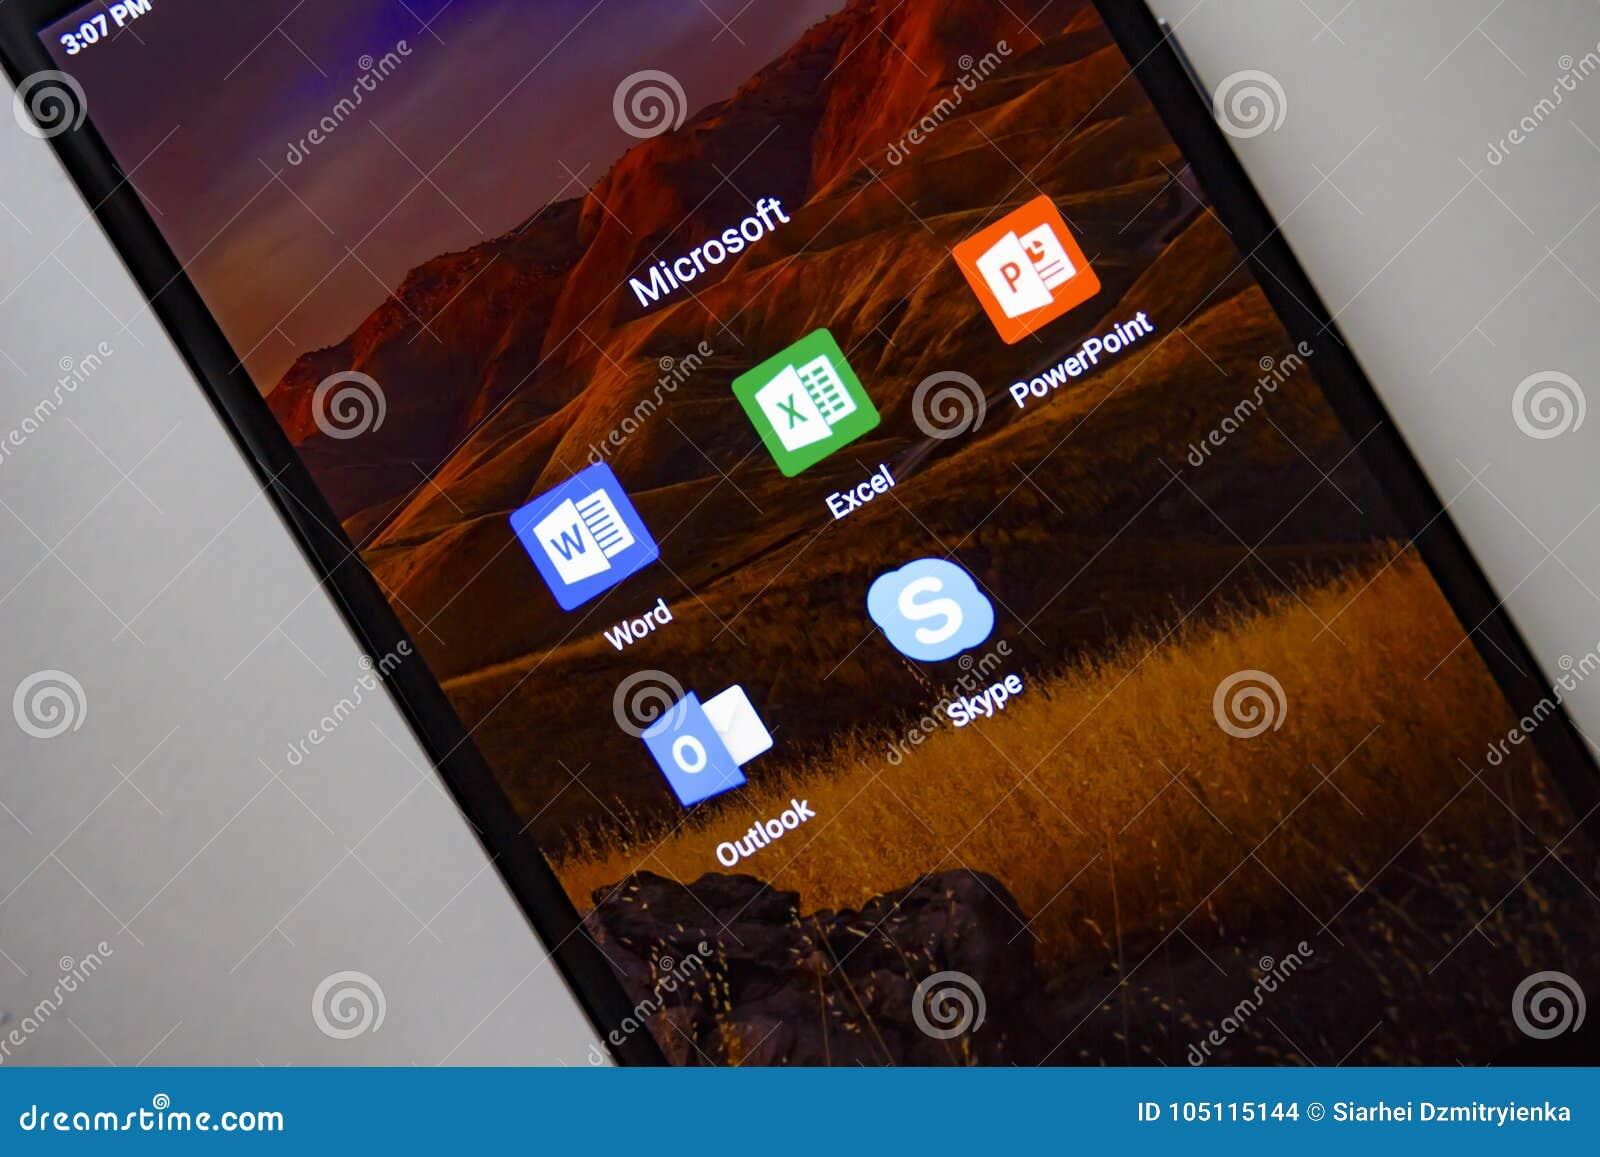 Berlin, Germany - November 19, 2017: Microsoft apps on screen modern smartphone. Word, Exel, PowerPoint, Outlook